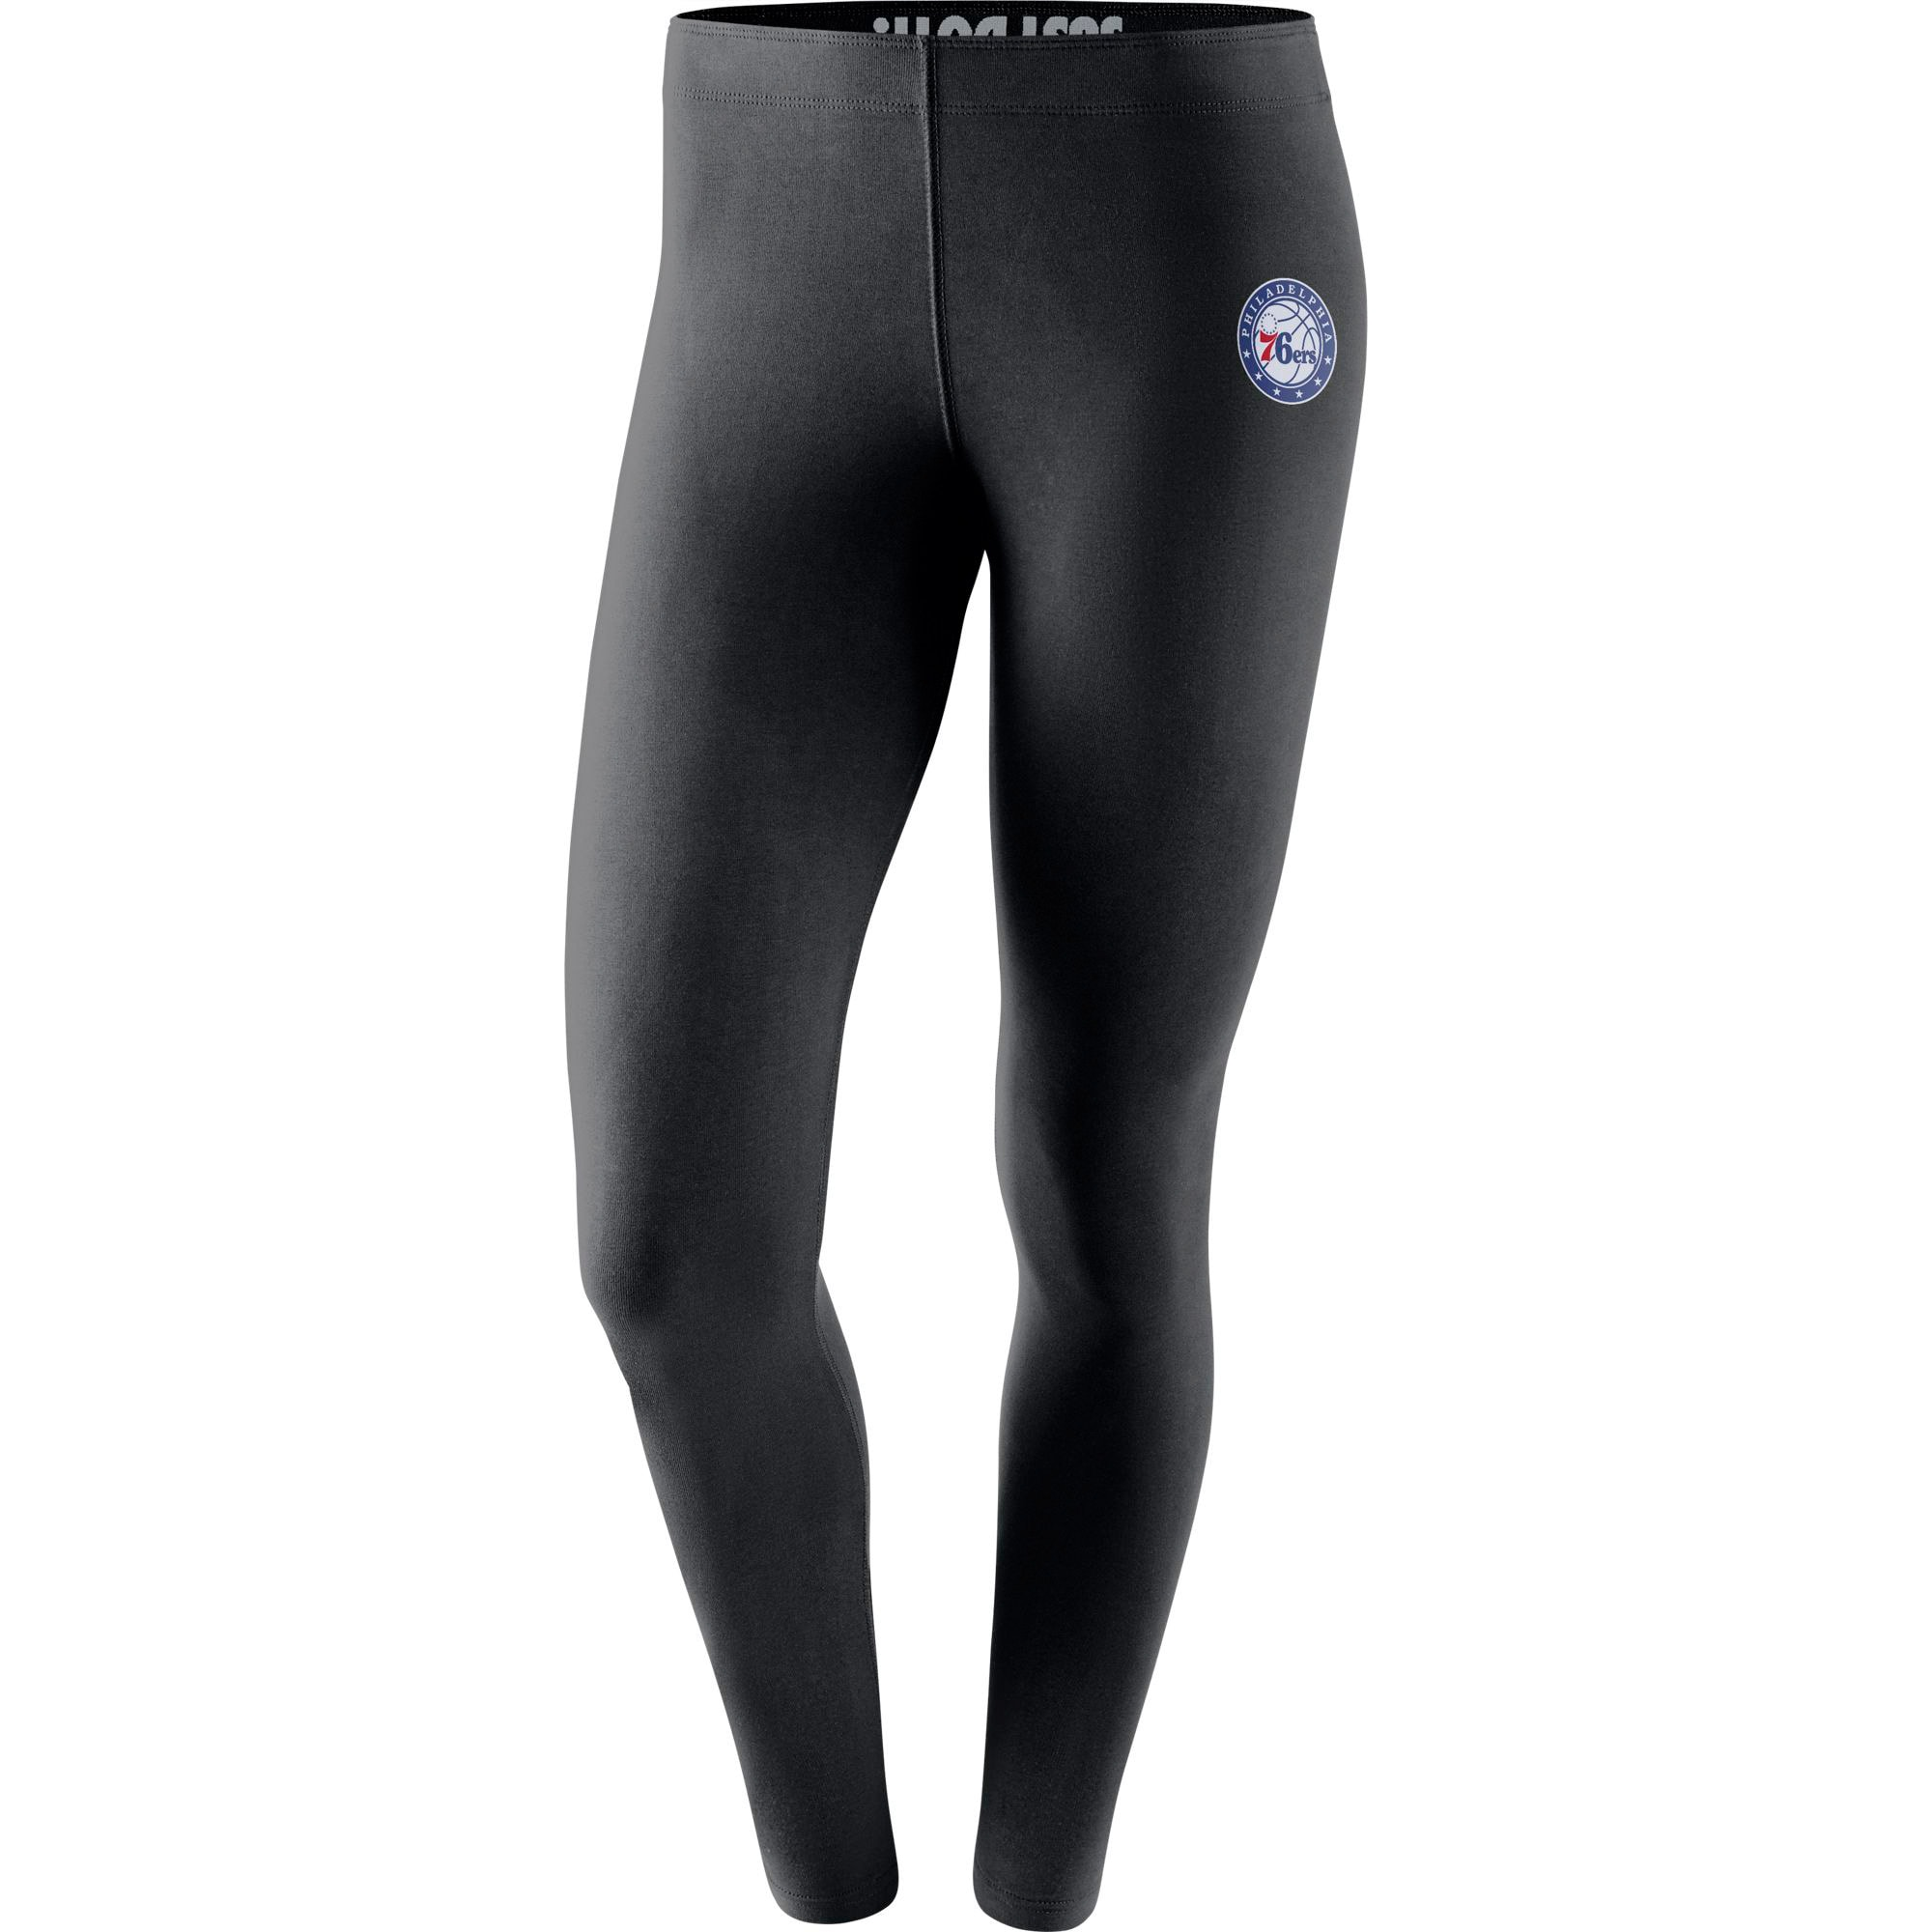 Philadelphia 76ers Nike Women's Leg-A-See Tights - Black